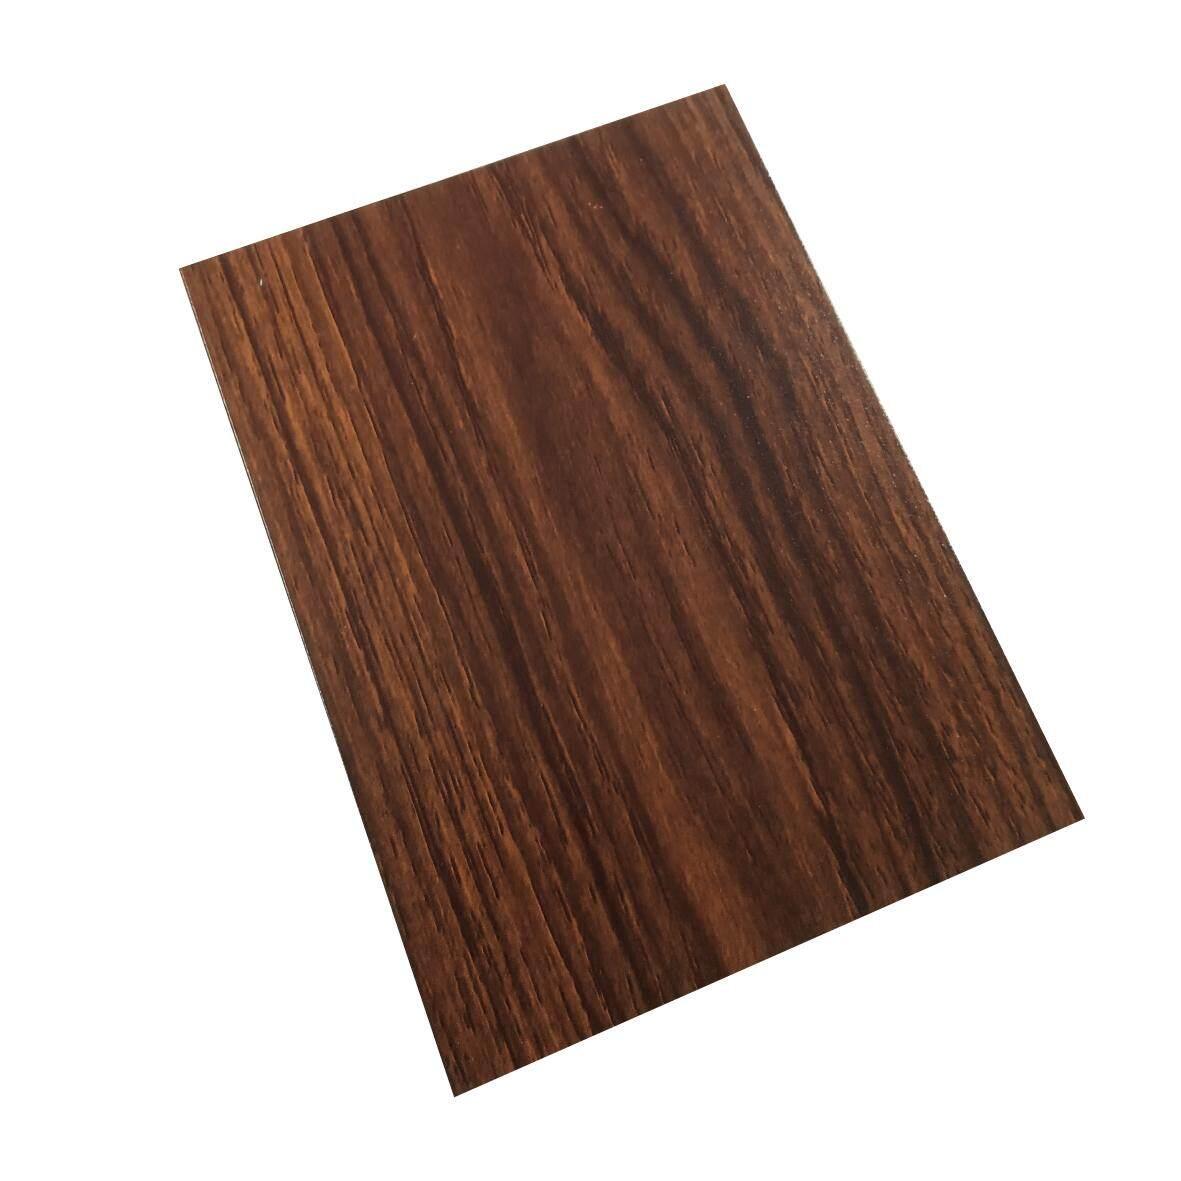 Buy Aluminium Gate / Fencing Profiles with Finishing Wood Grain Texture (5  feet) Malaysia